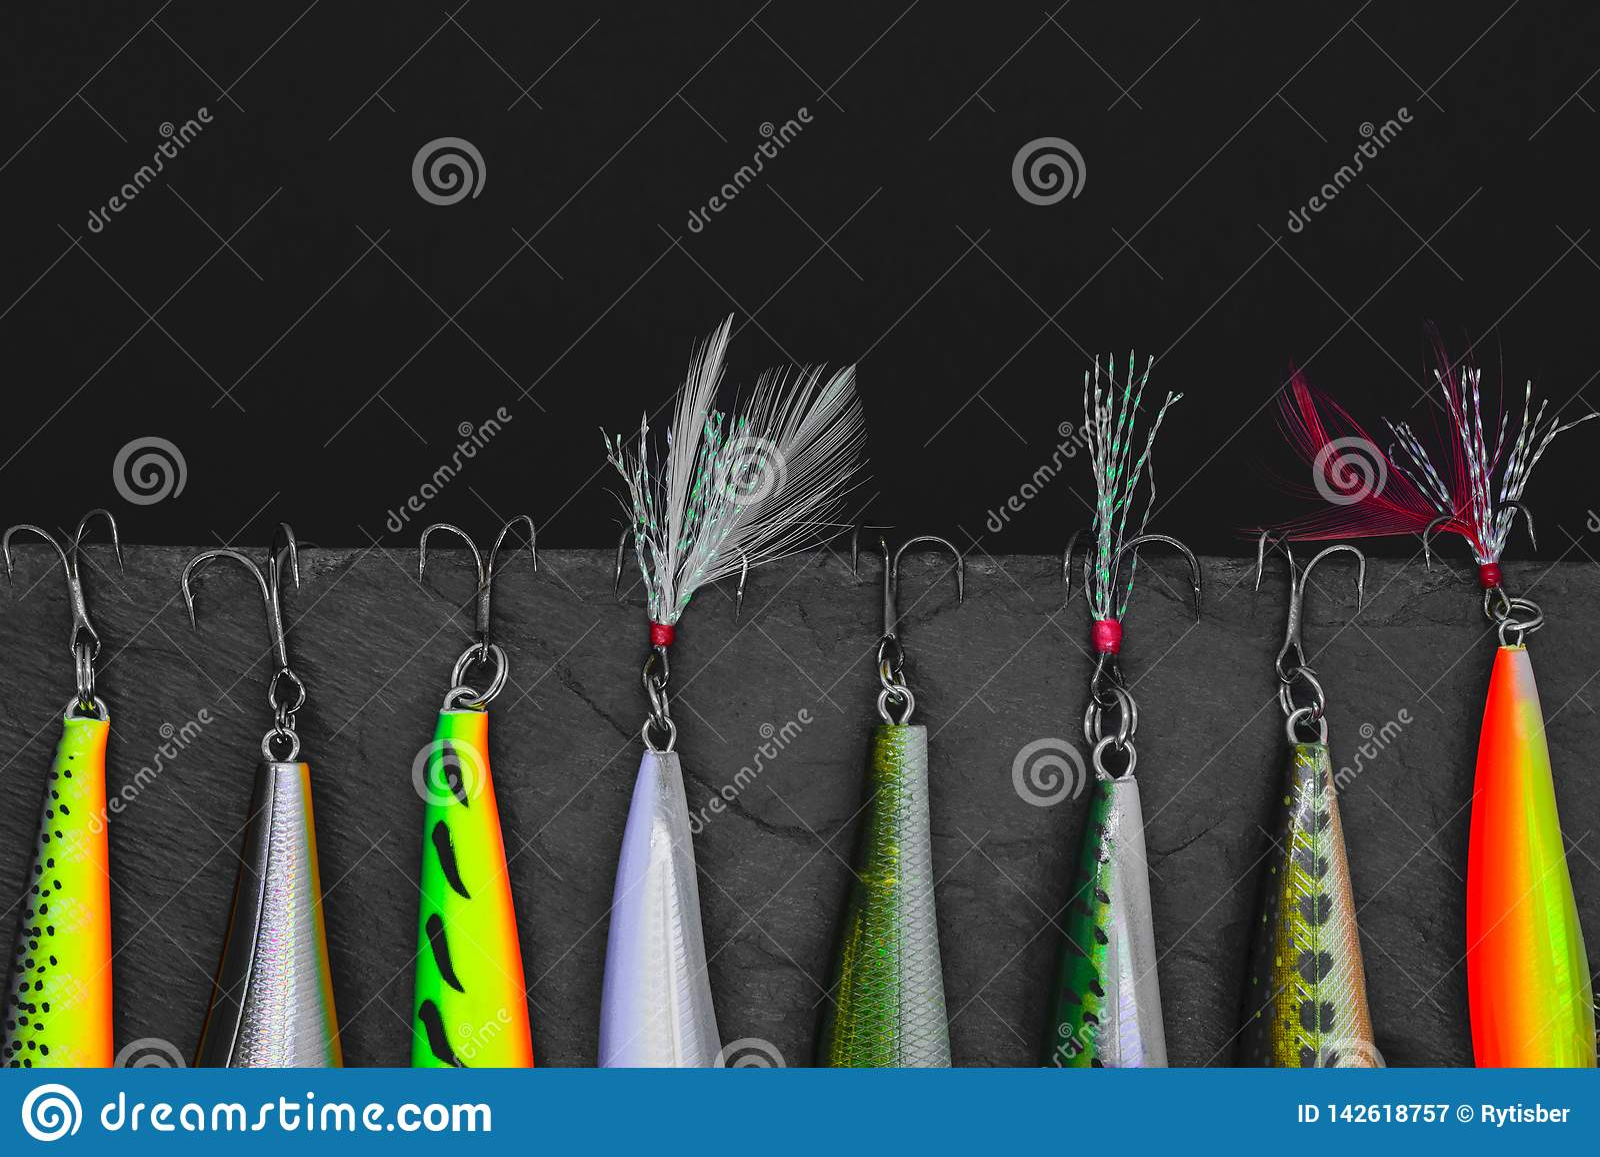 Vilnius, Λιθουανία - 17 ΜΑΡΤΊΟΥ 2019 τα wobblers αλιείας δελεάζουν την ένωση στο μαύρο υπόβαθρο πετρών